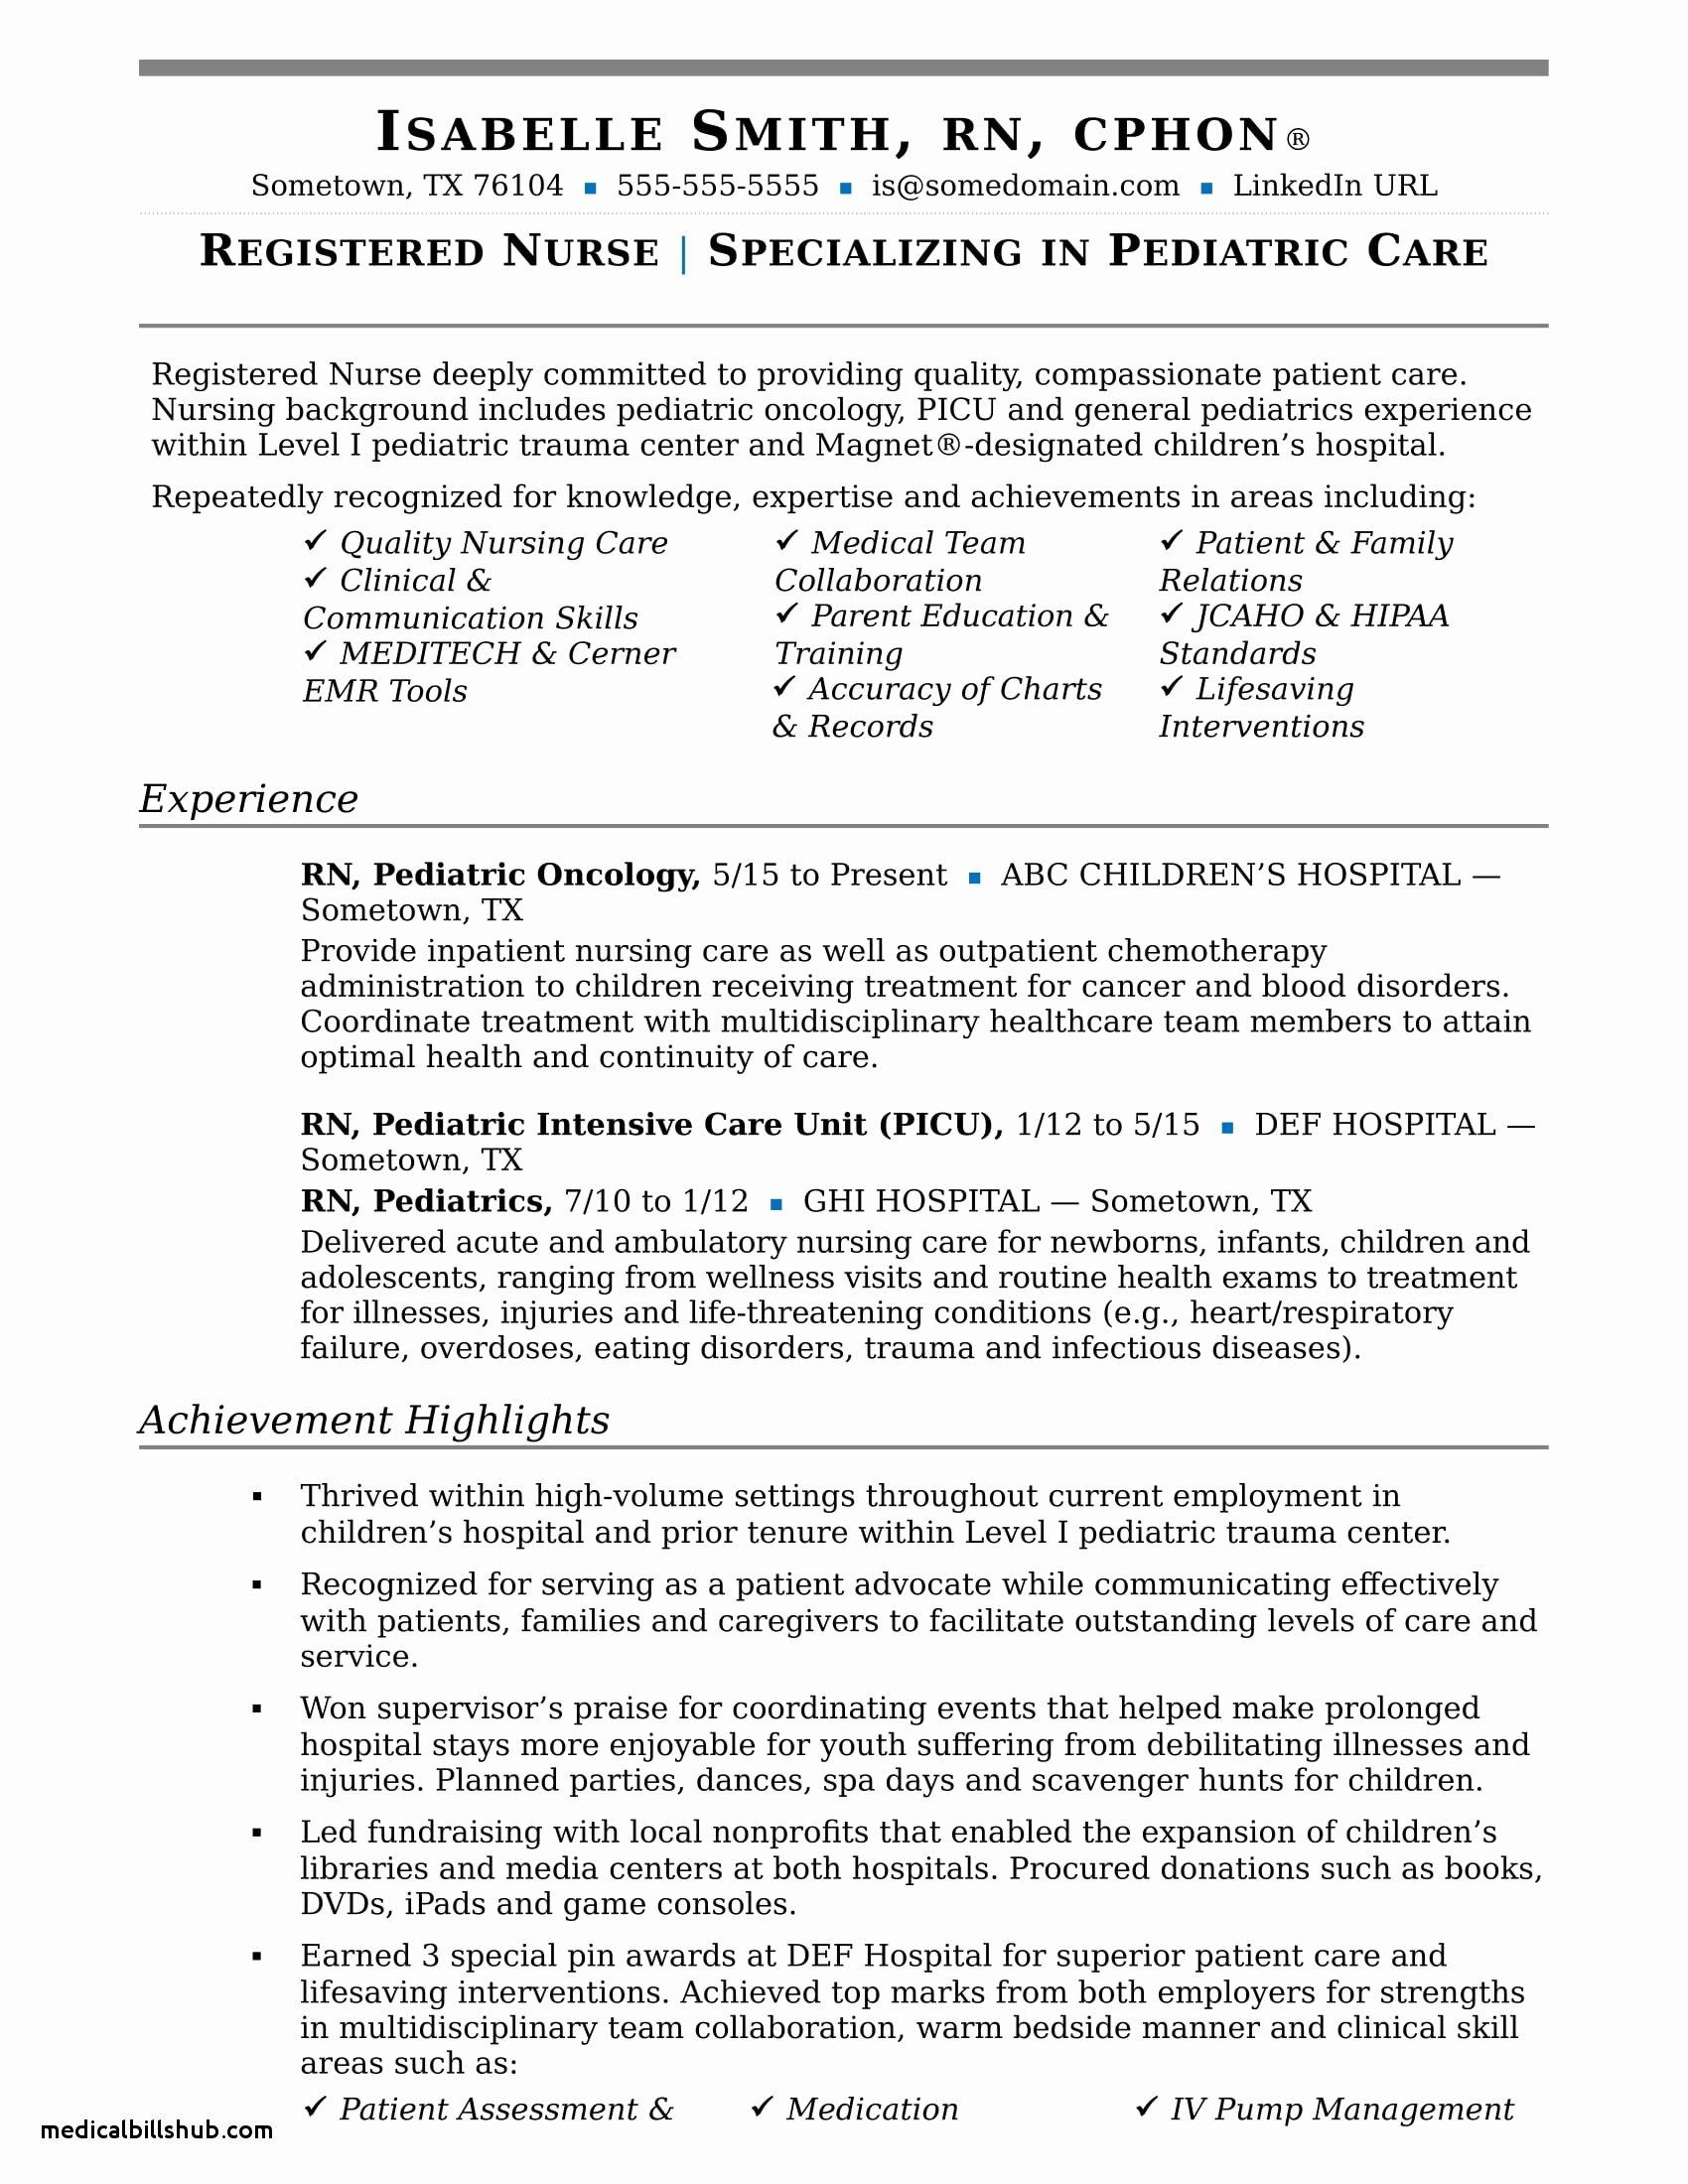 New Grad Nursing Resume Clinical Experience associates